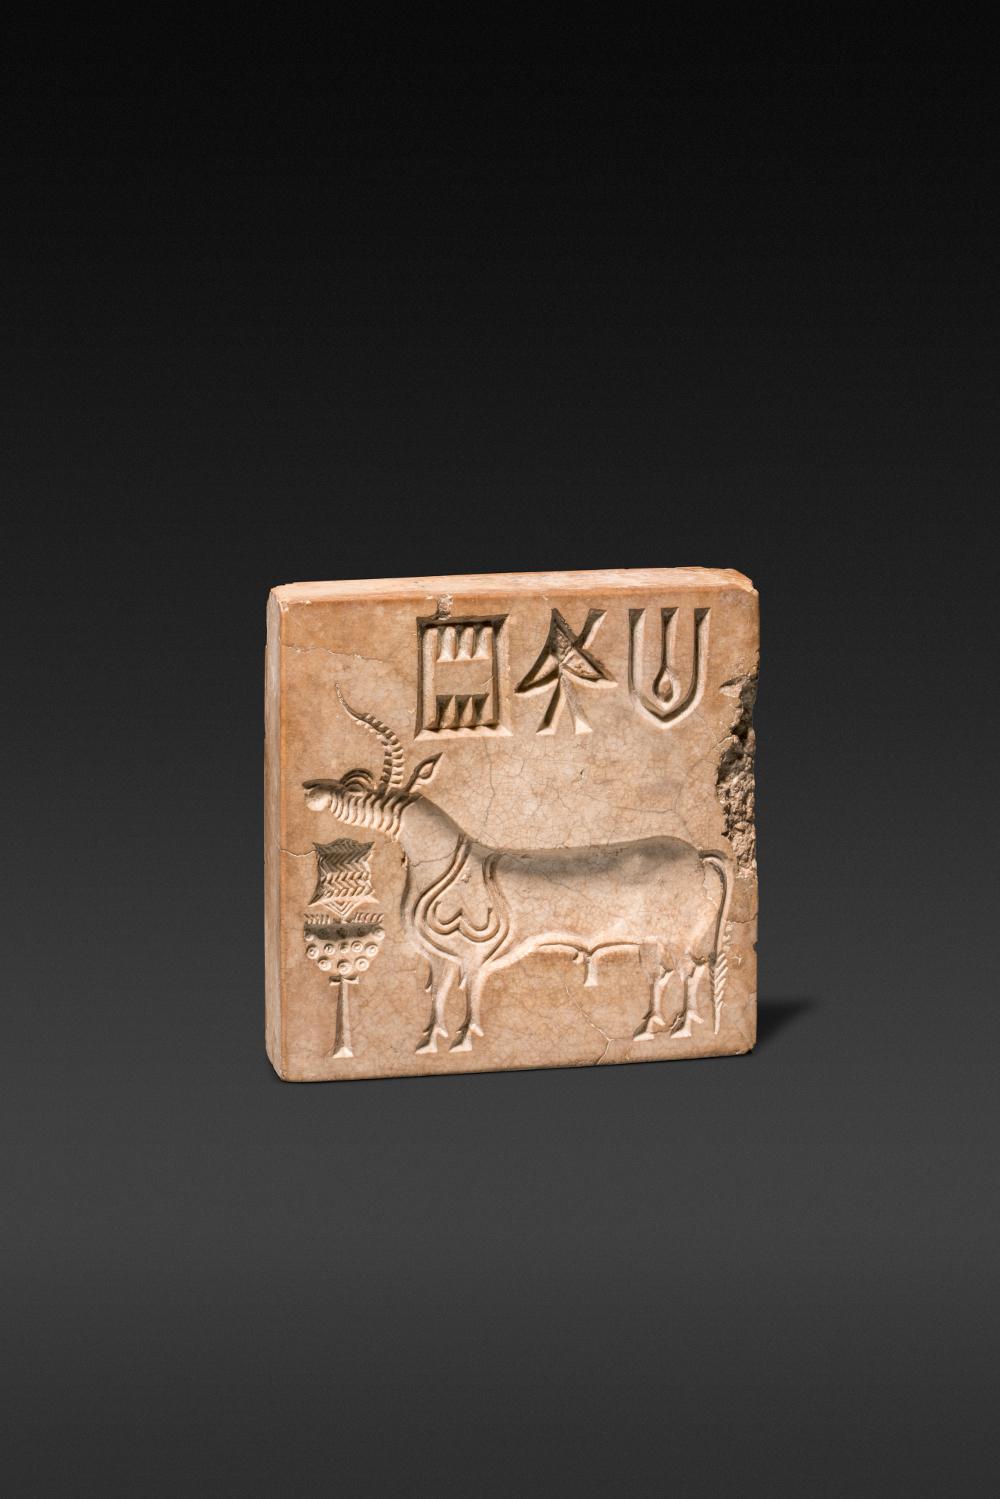 Harappan bull or 'unicorn' seal with censer and 'script' - Steatite2500–2000 BCMohenjodaro, Sindh, PakistanNational Museum, New Delhi